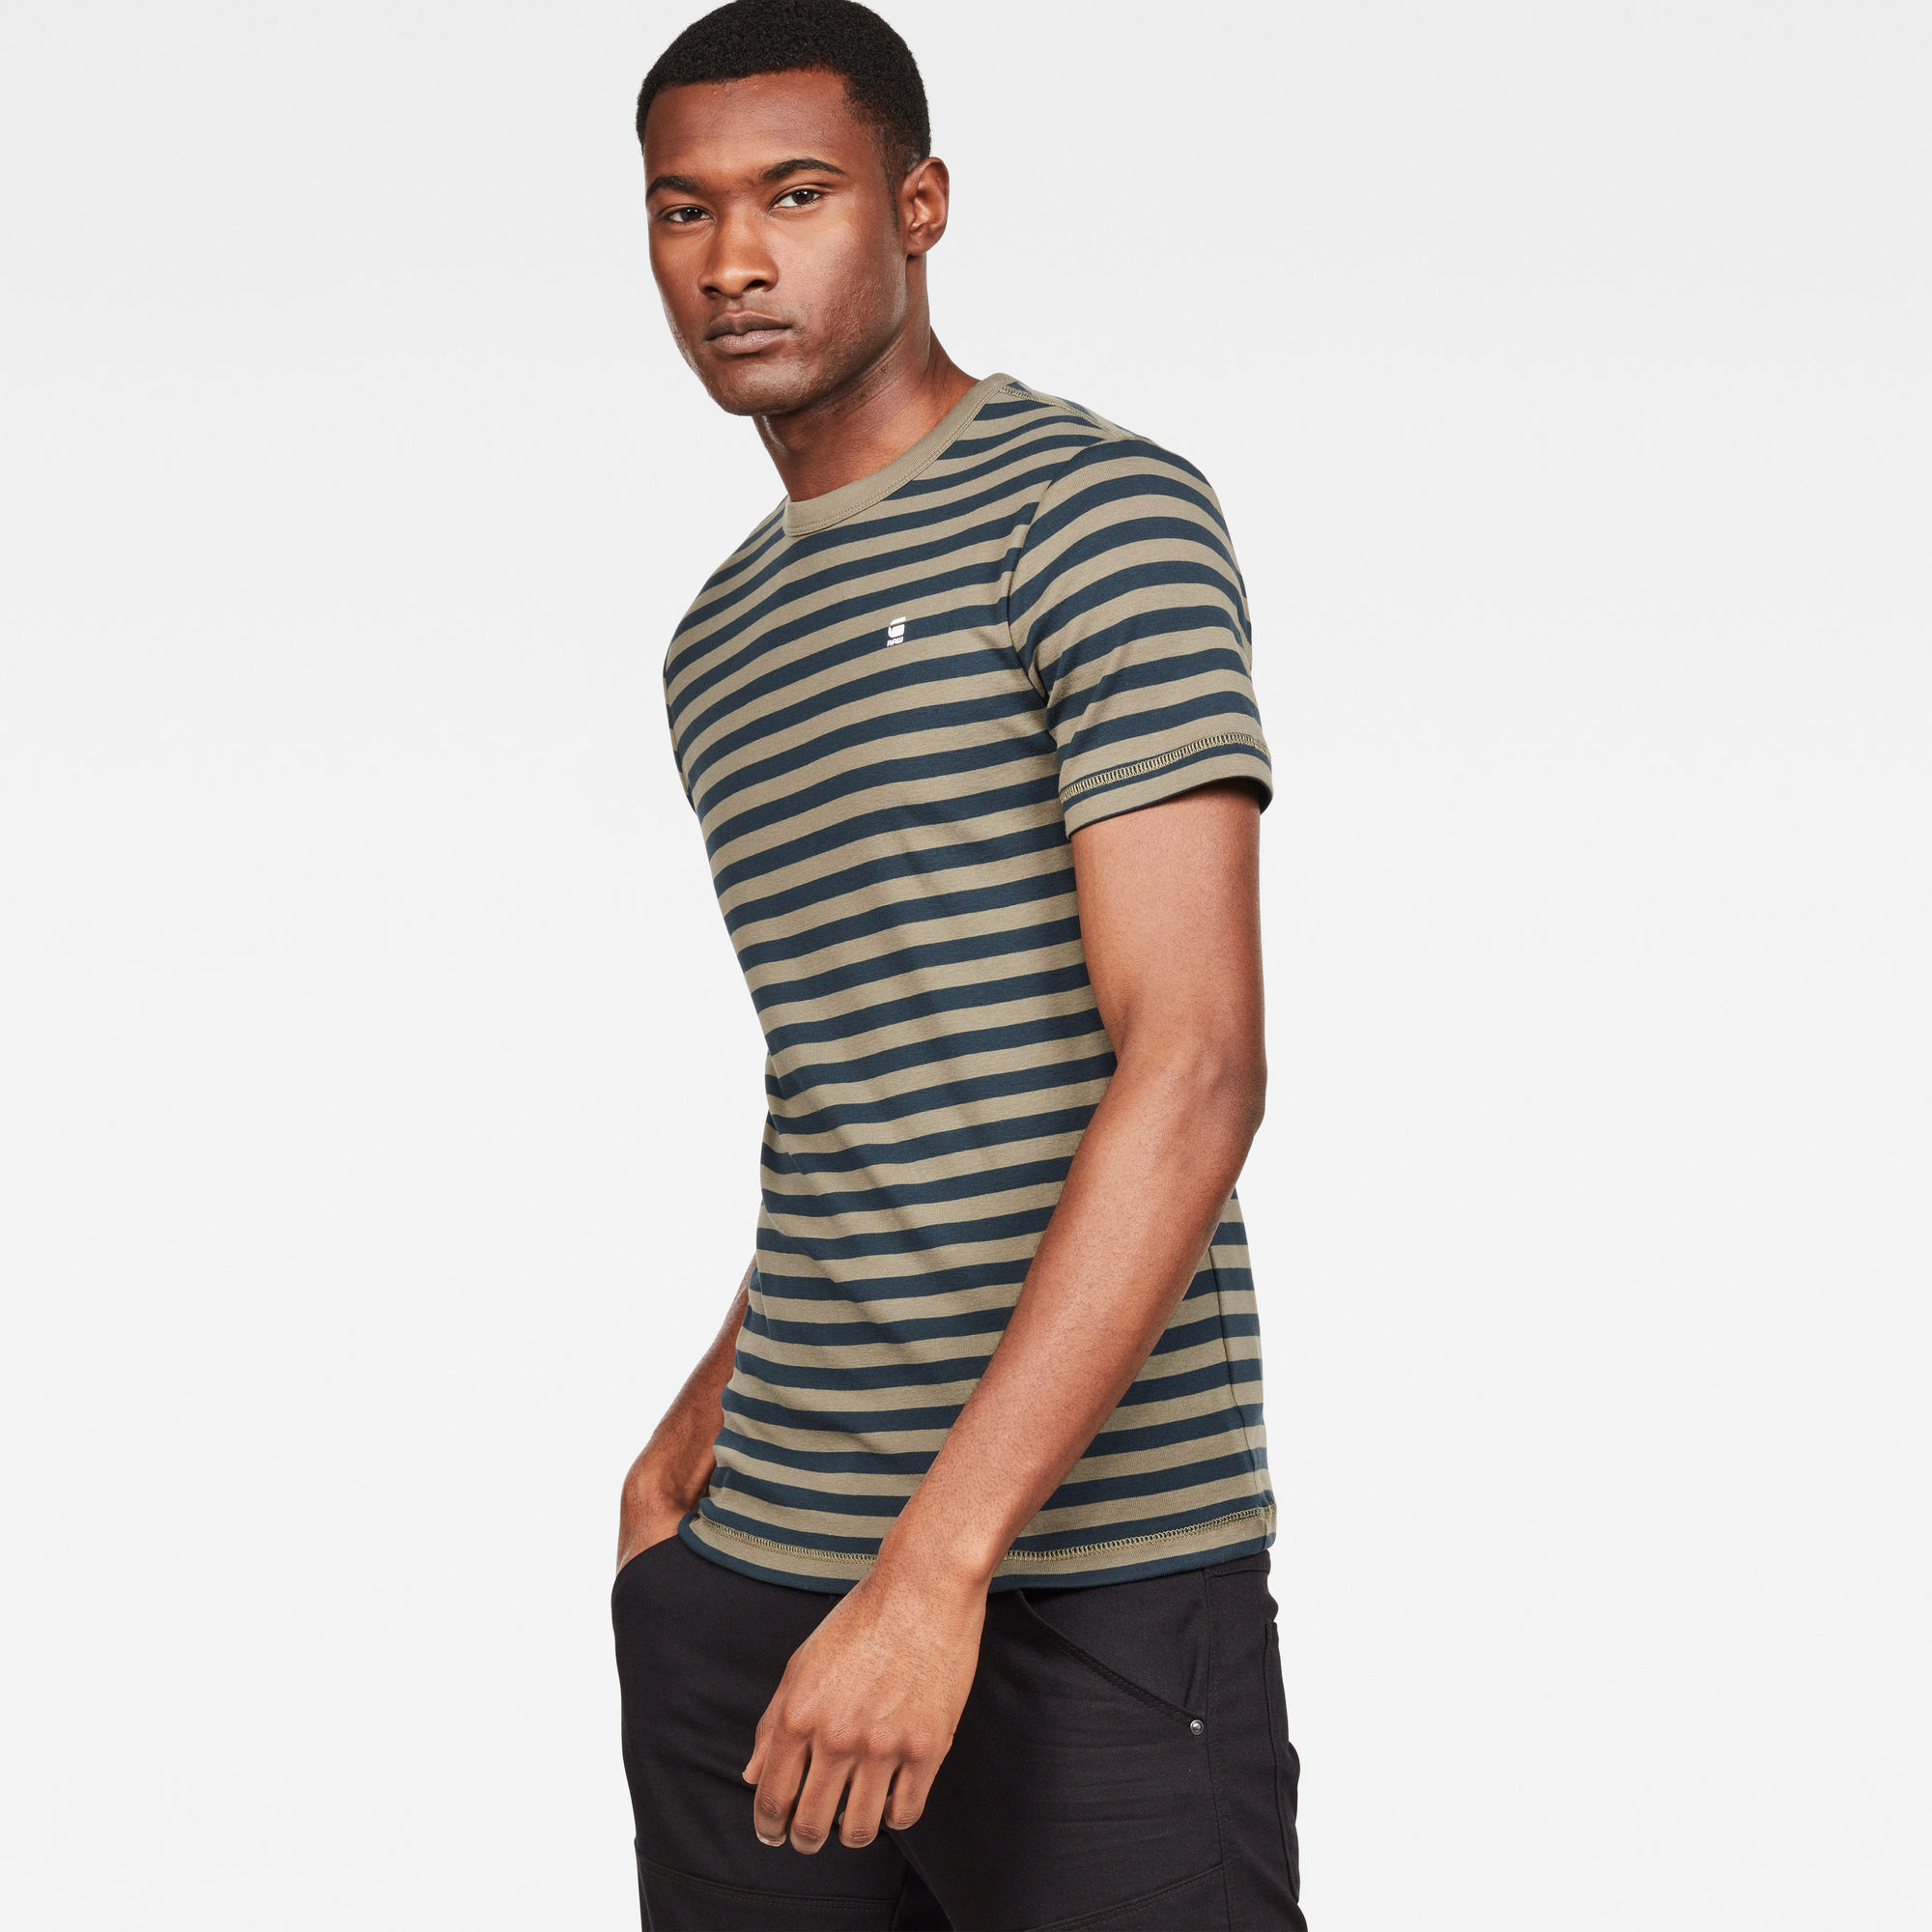 G-Star RAW Kantano Slim T-Shirt